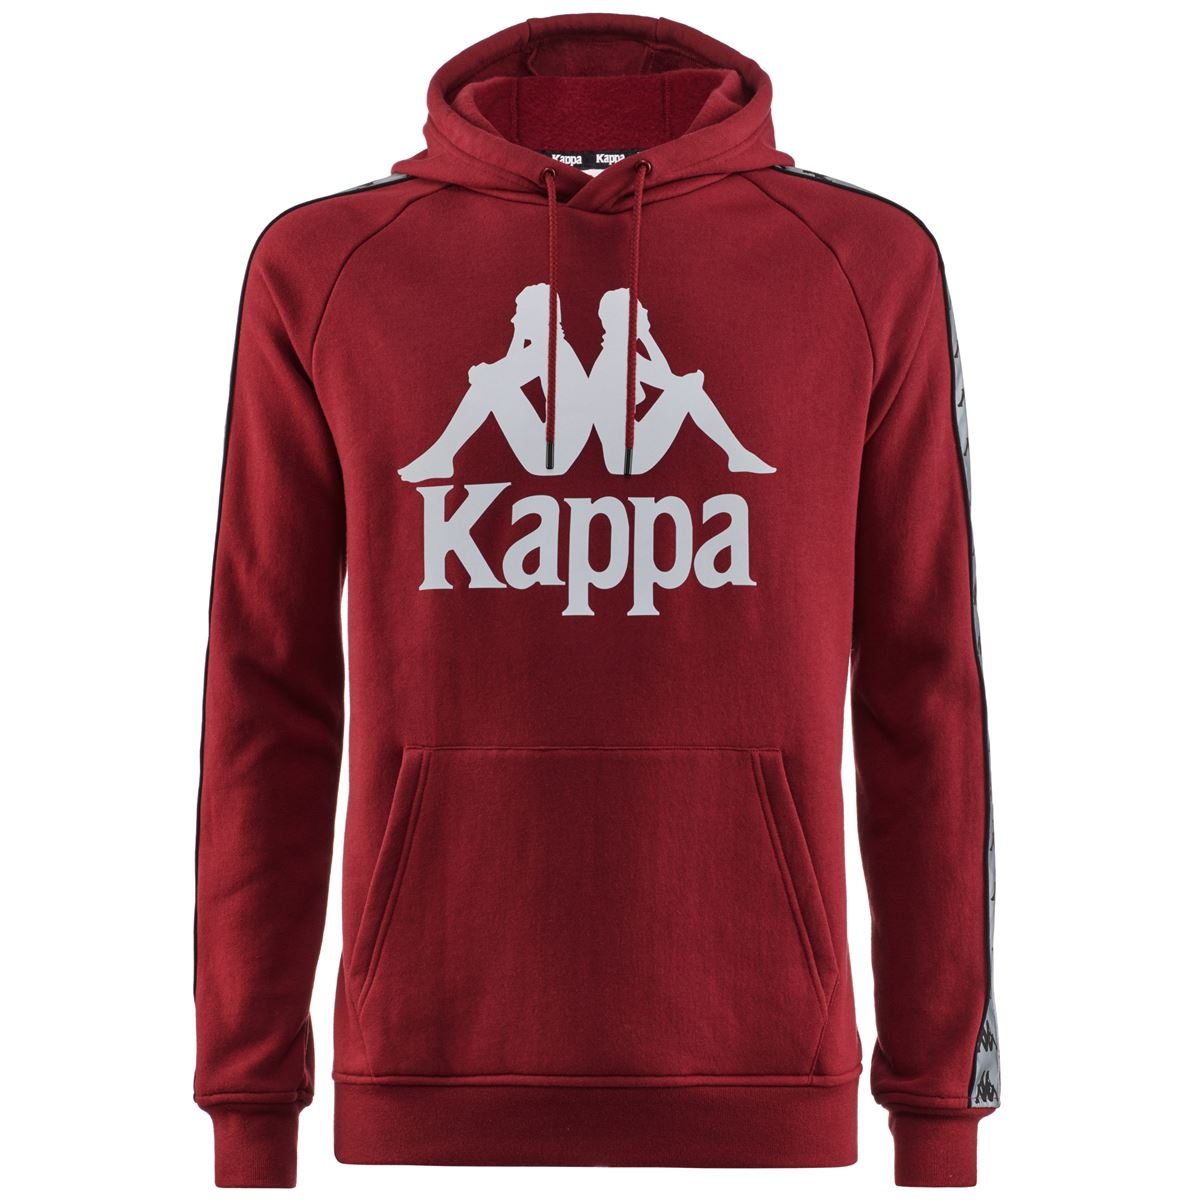 Felpa unisex con cappuccio in felpa garzata Kappa | Felpa | 3116NXWA03 RED DAHLIA-SILVER